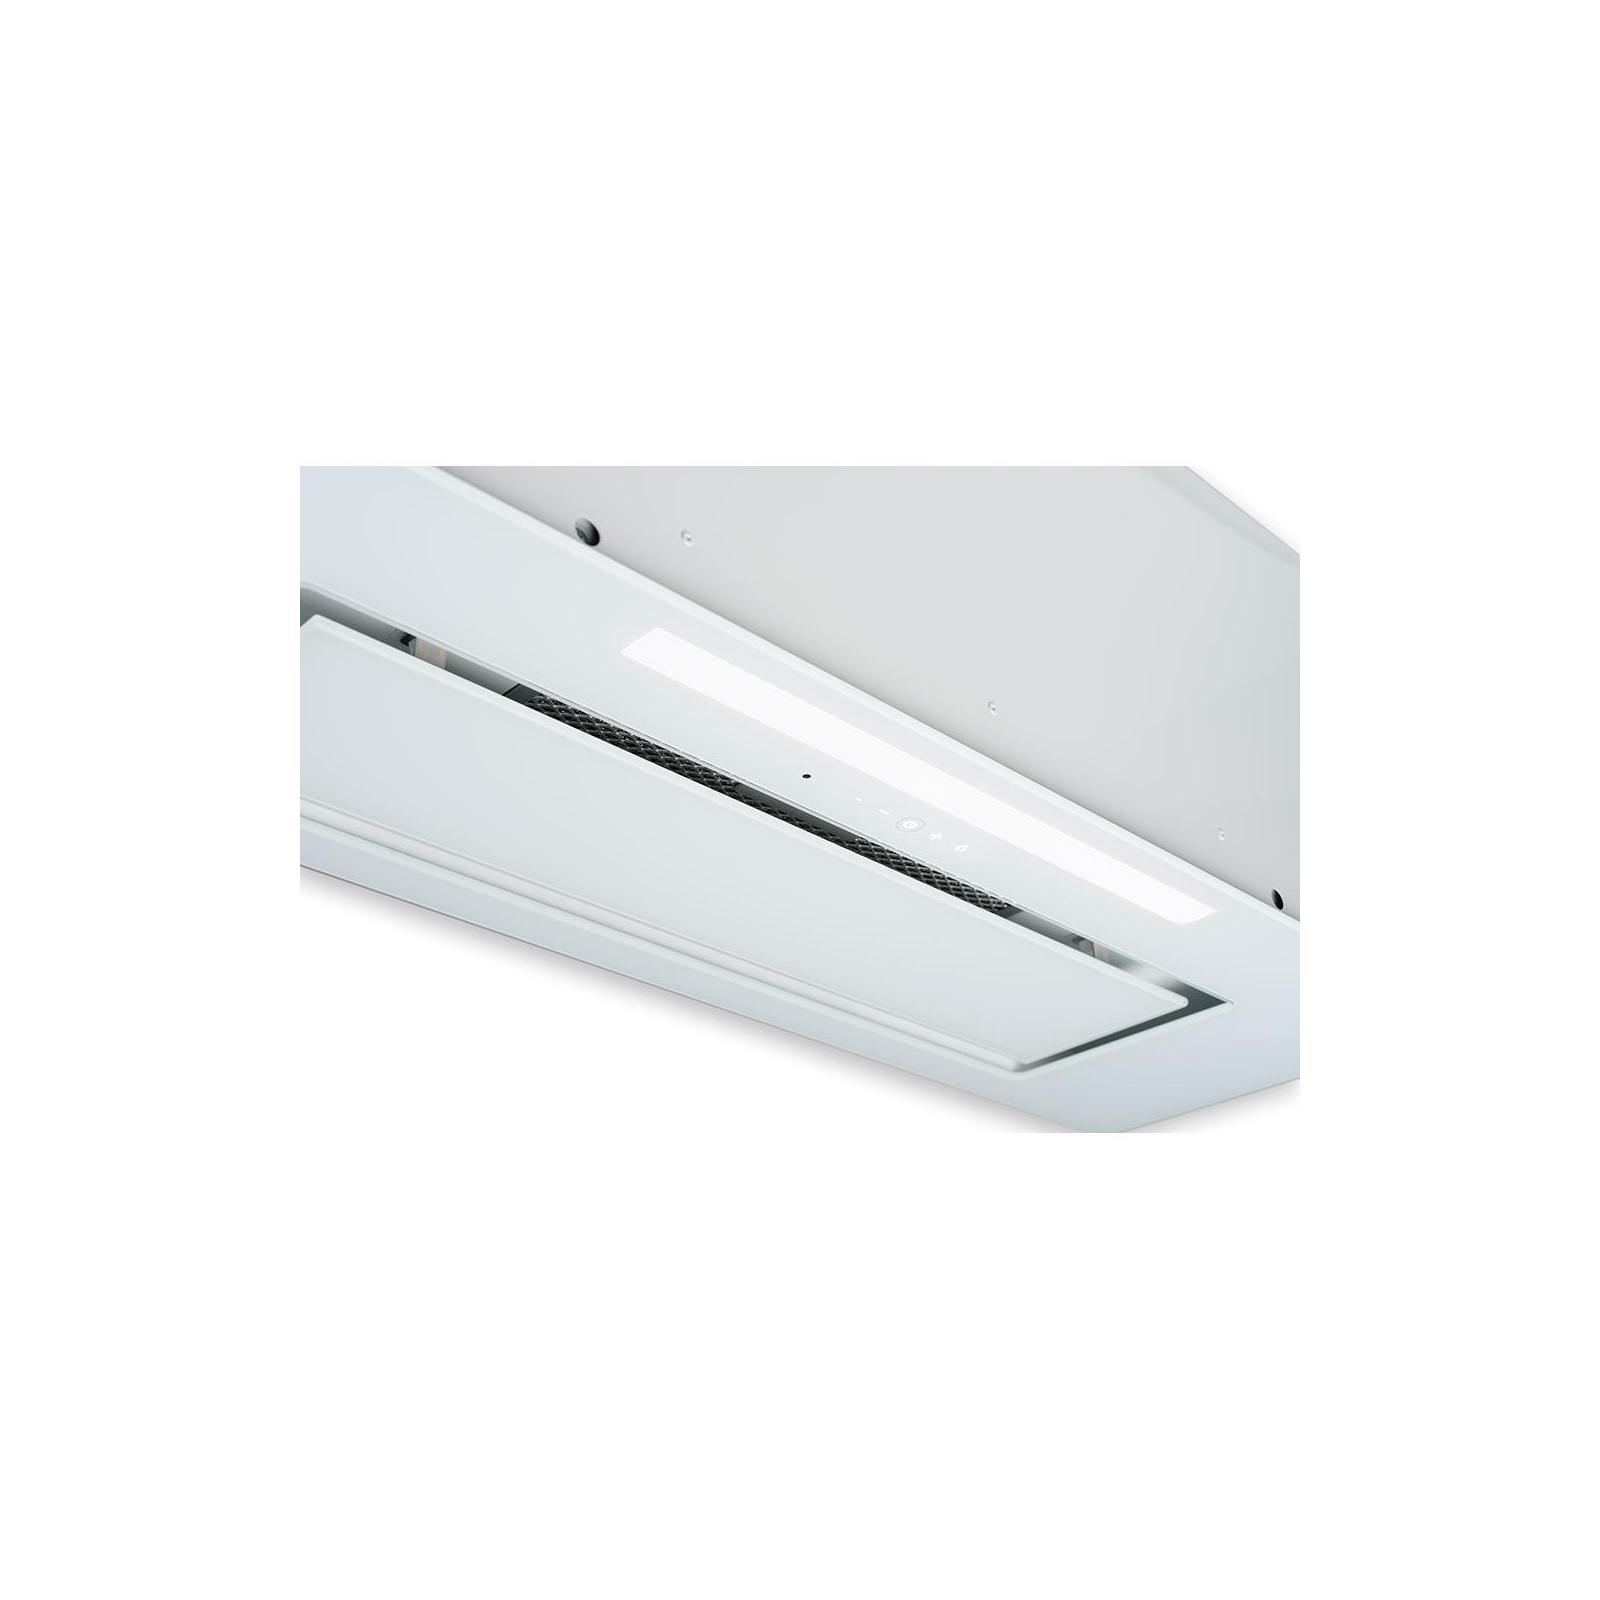 Вытяжка кухонная PERFELLI BISP 9973 A 1250 W LED Strip изображение 5